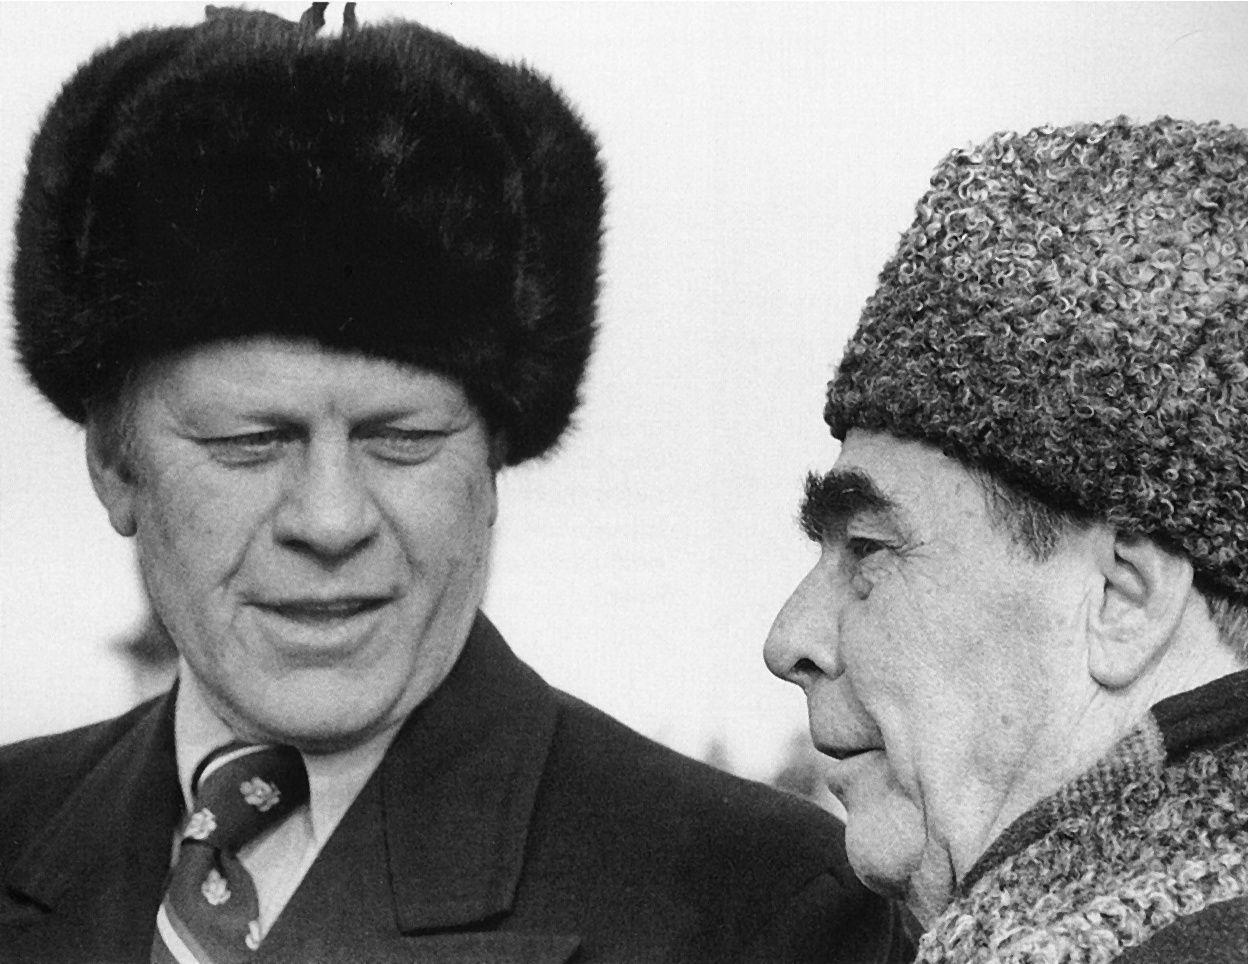 Gerald Ford Quotes Gerald Ford And Leonid Brezhnev Meeting In Vladivistok November